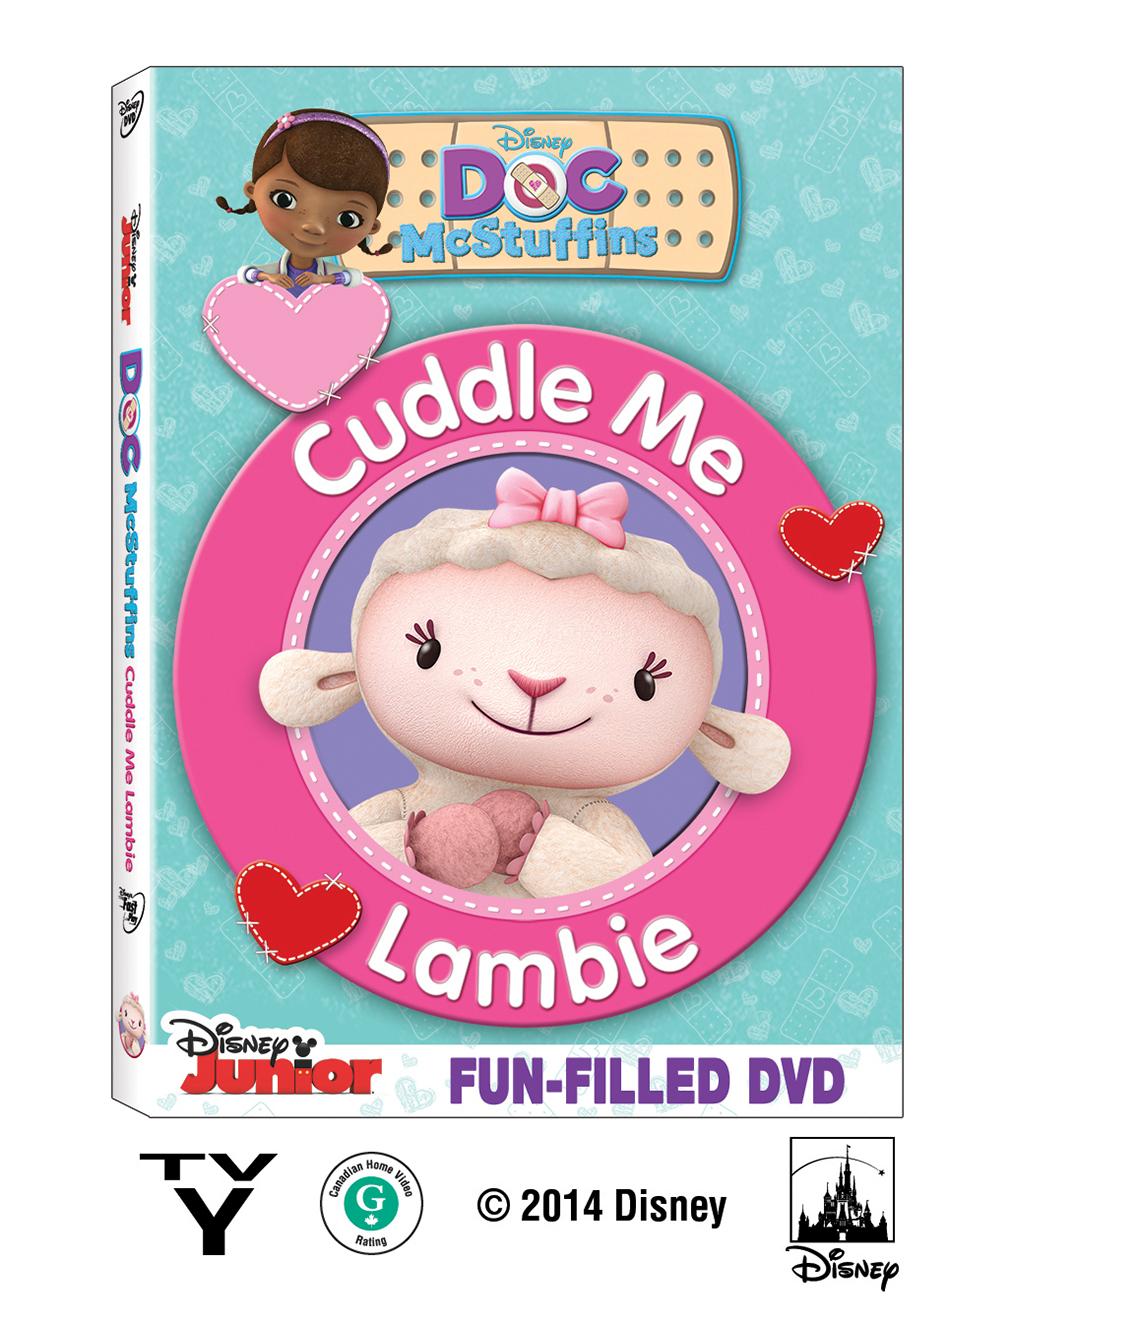 doc mcstuffins cuddle me lambie on dvd february 3 free